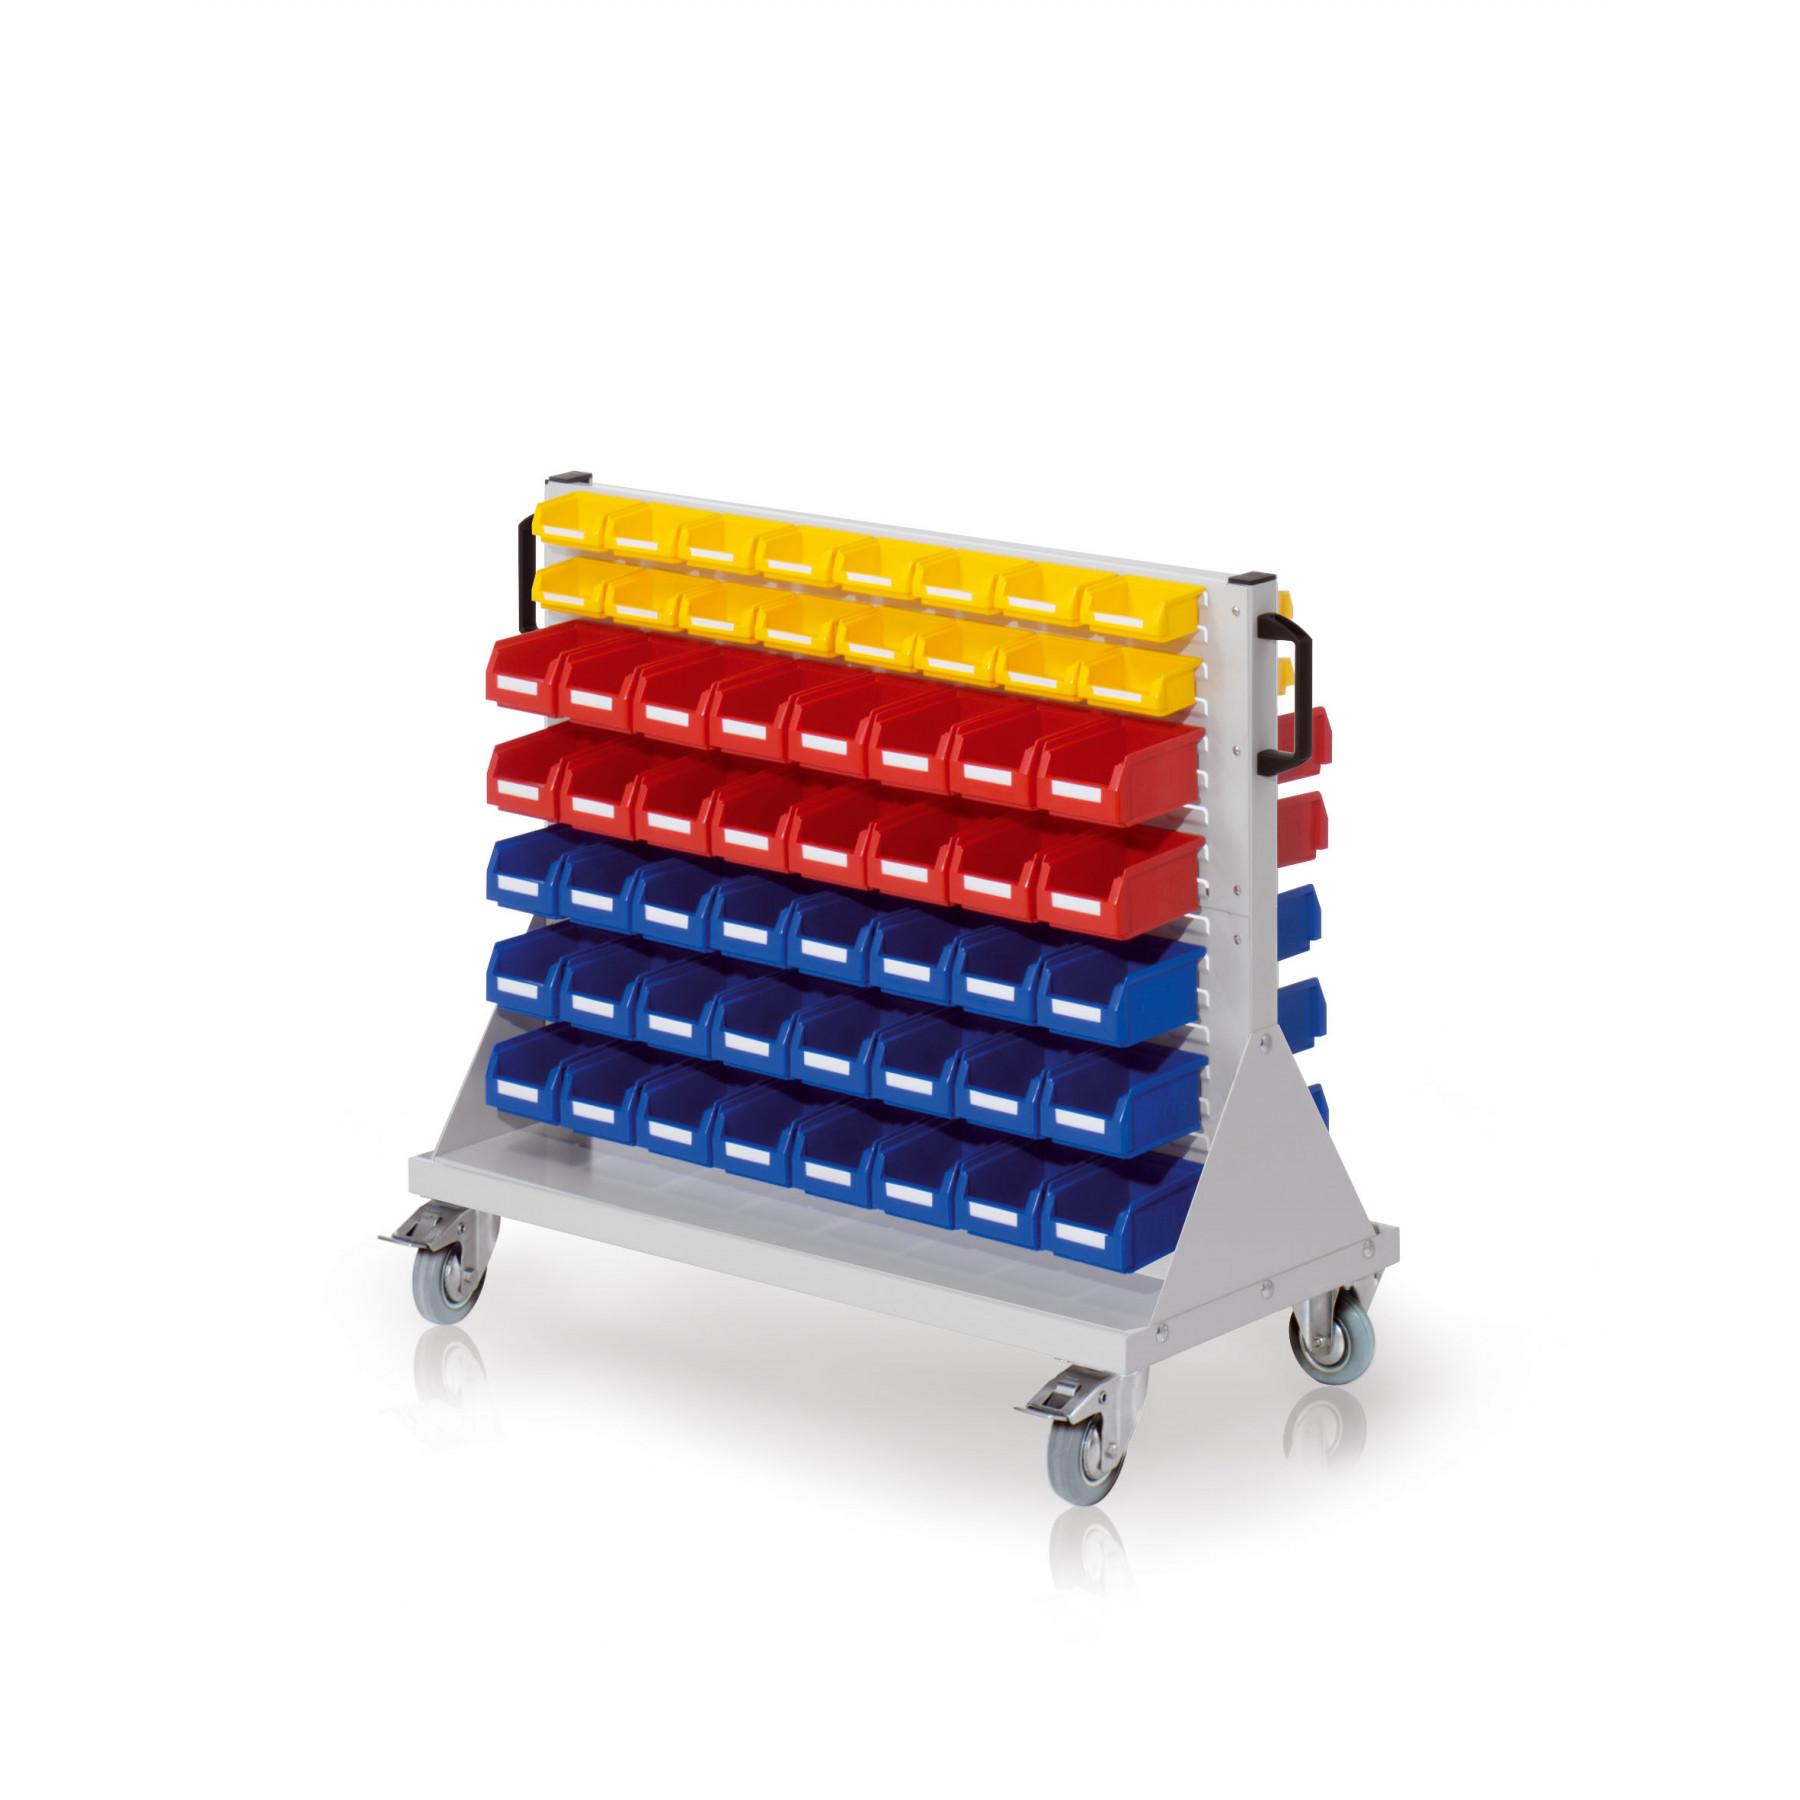 RasterMobil® rijdende bakkenstelling 1000x500x890 mm (LxBxH), 7020.05.0913